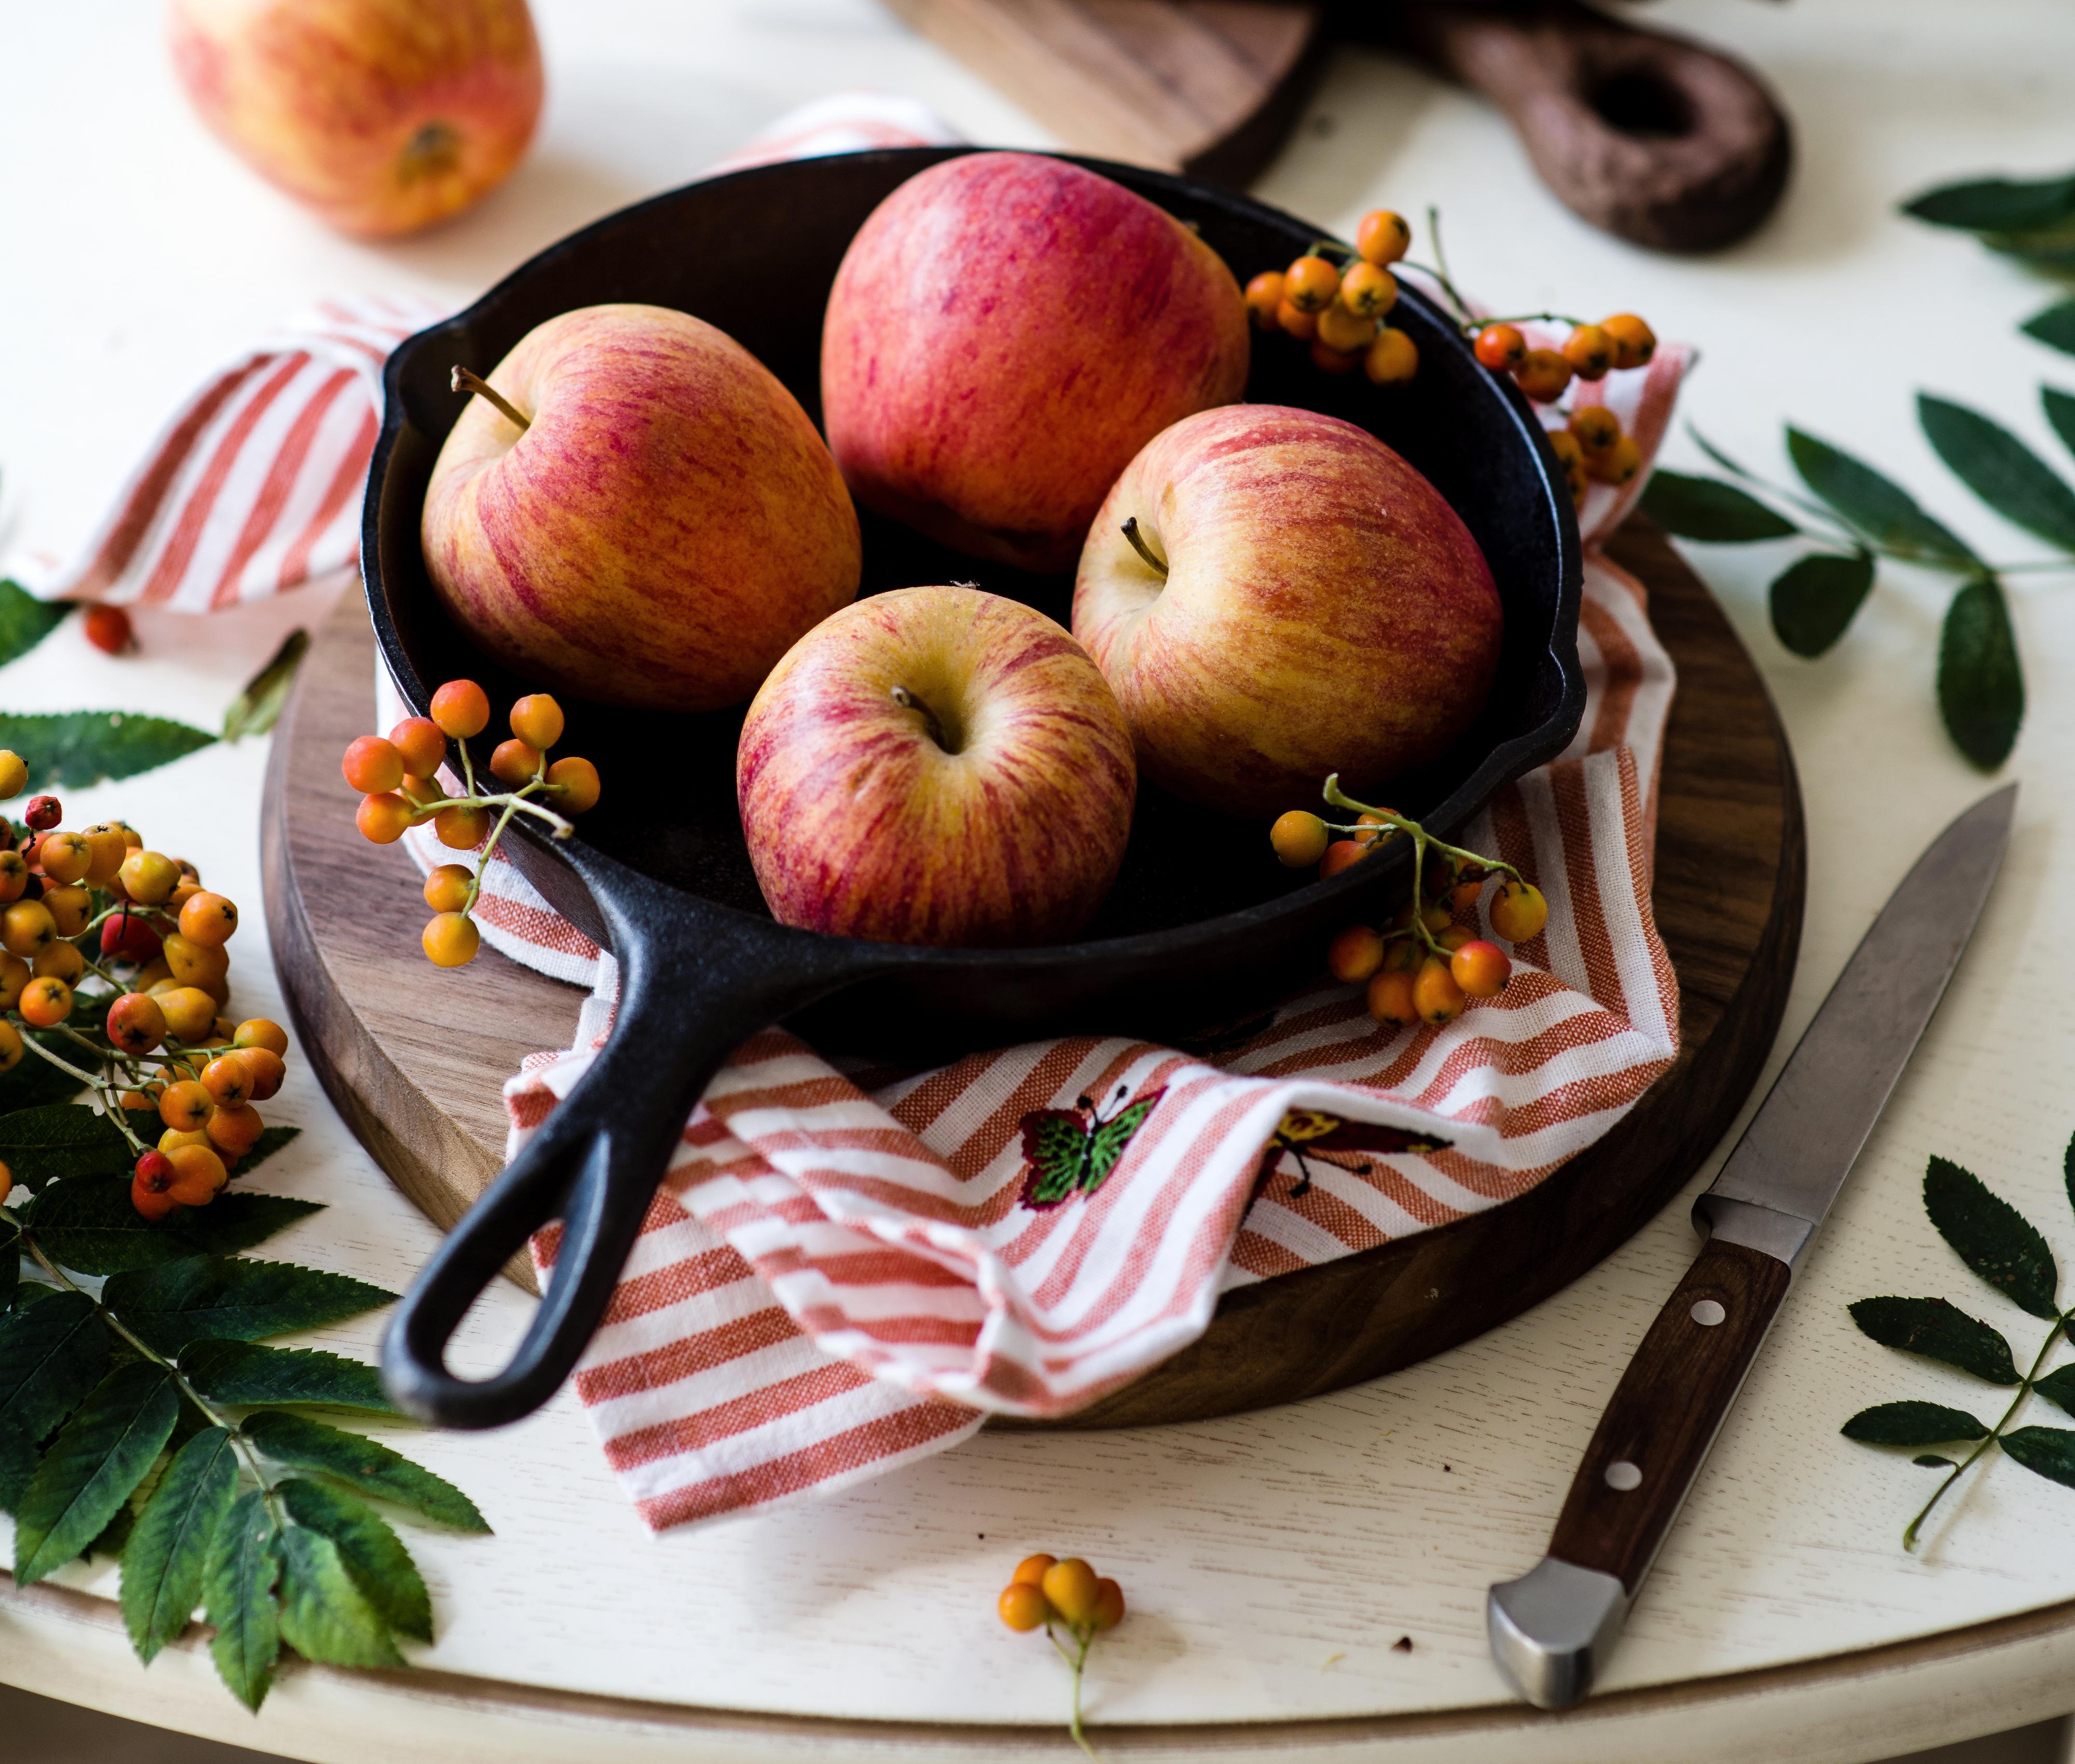 картинки яблоки на столе наступающий